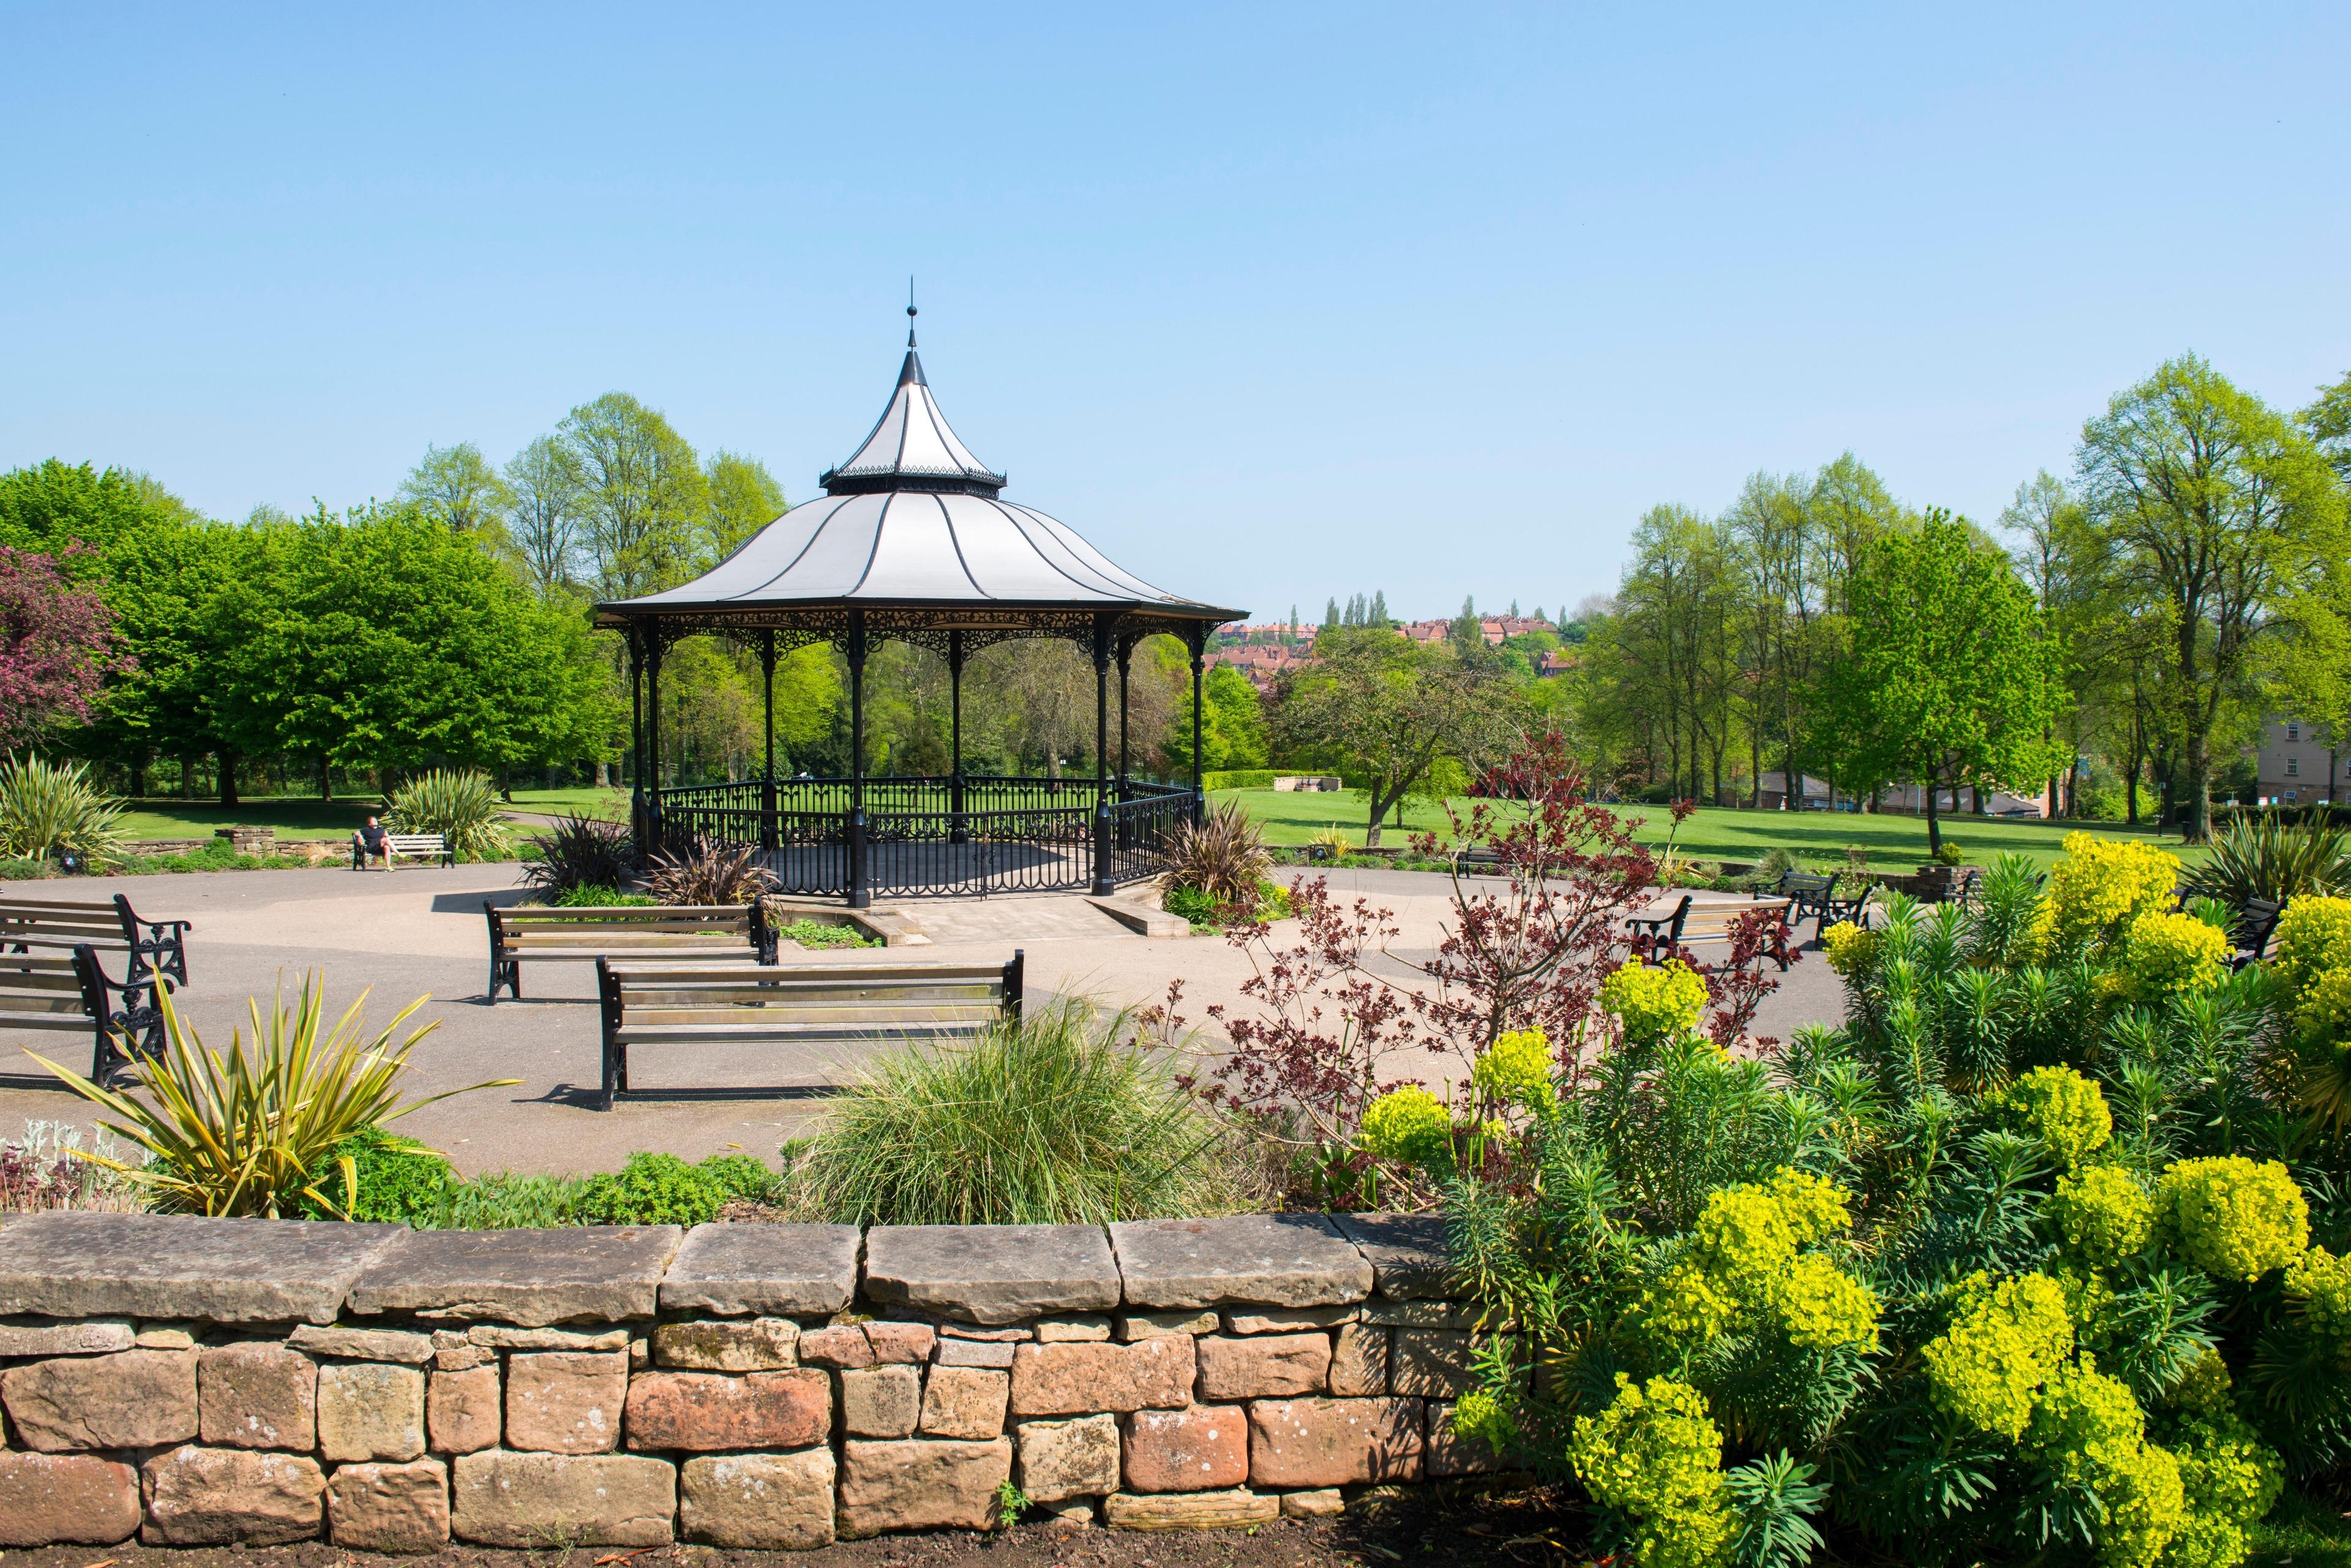 Mansfield, Engeland, Verenigd Koninkrijk